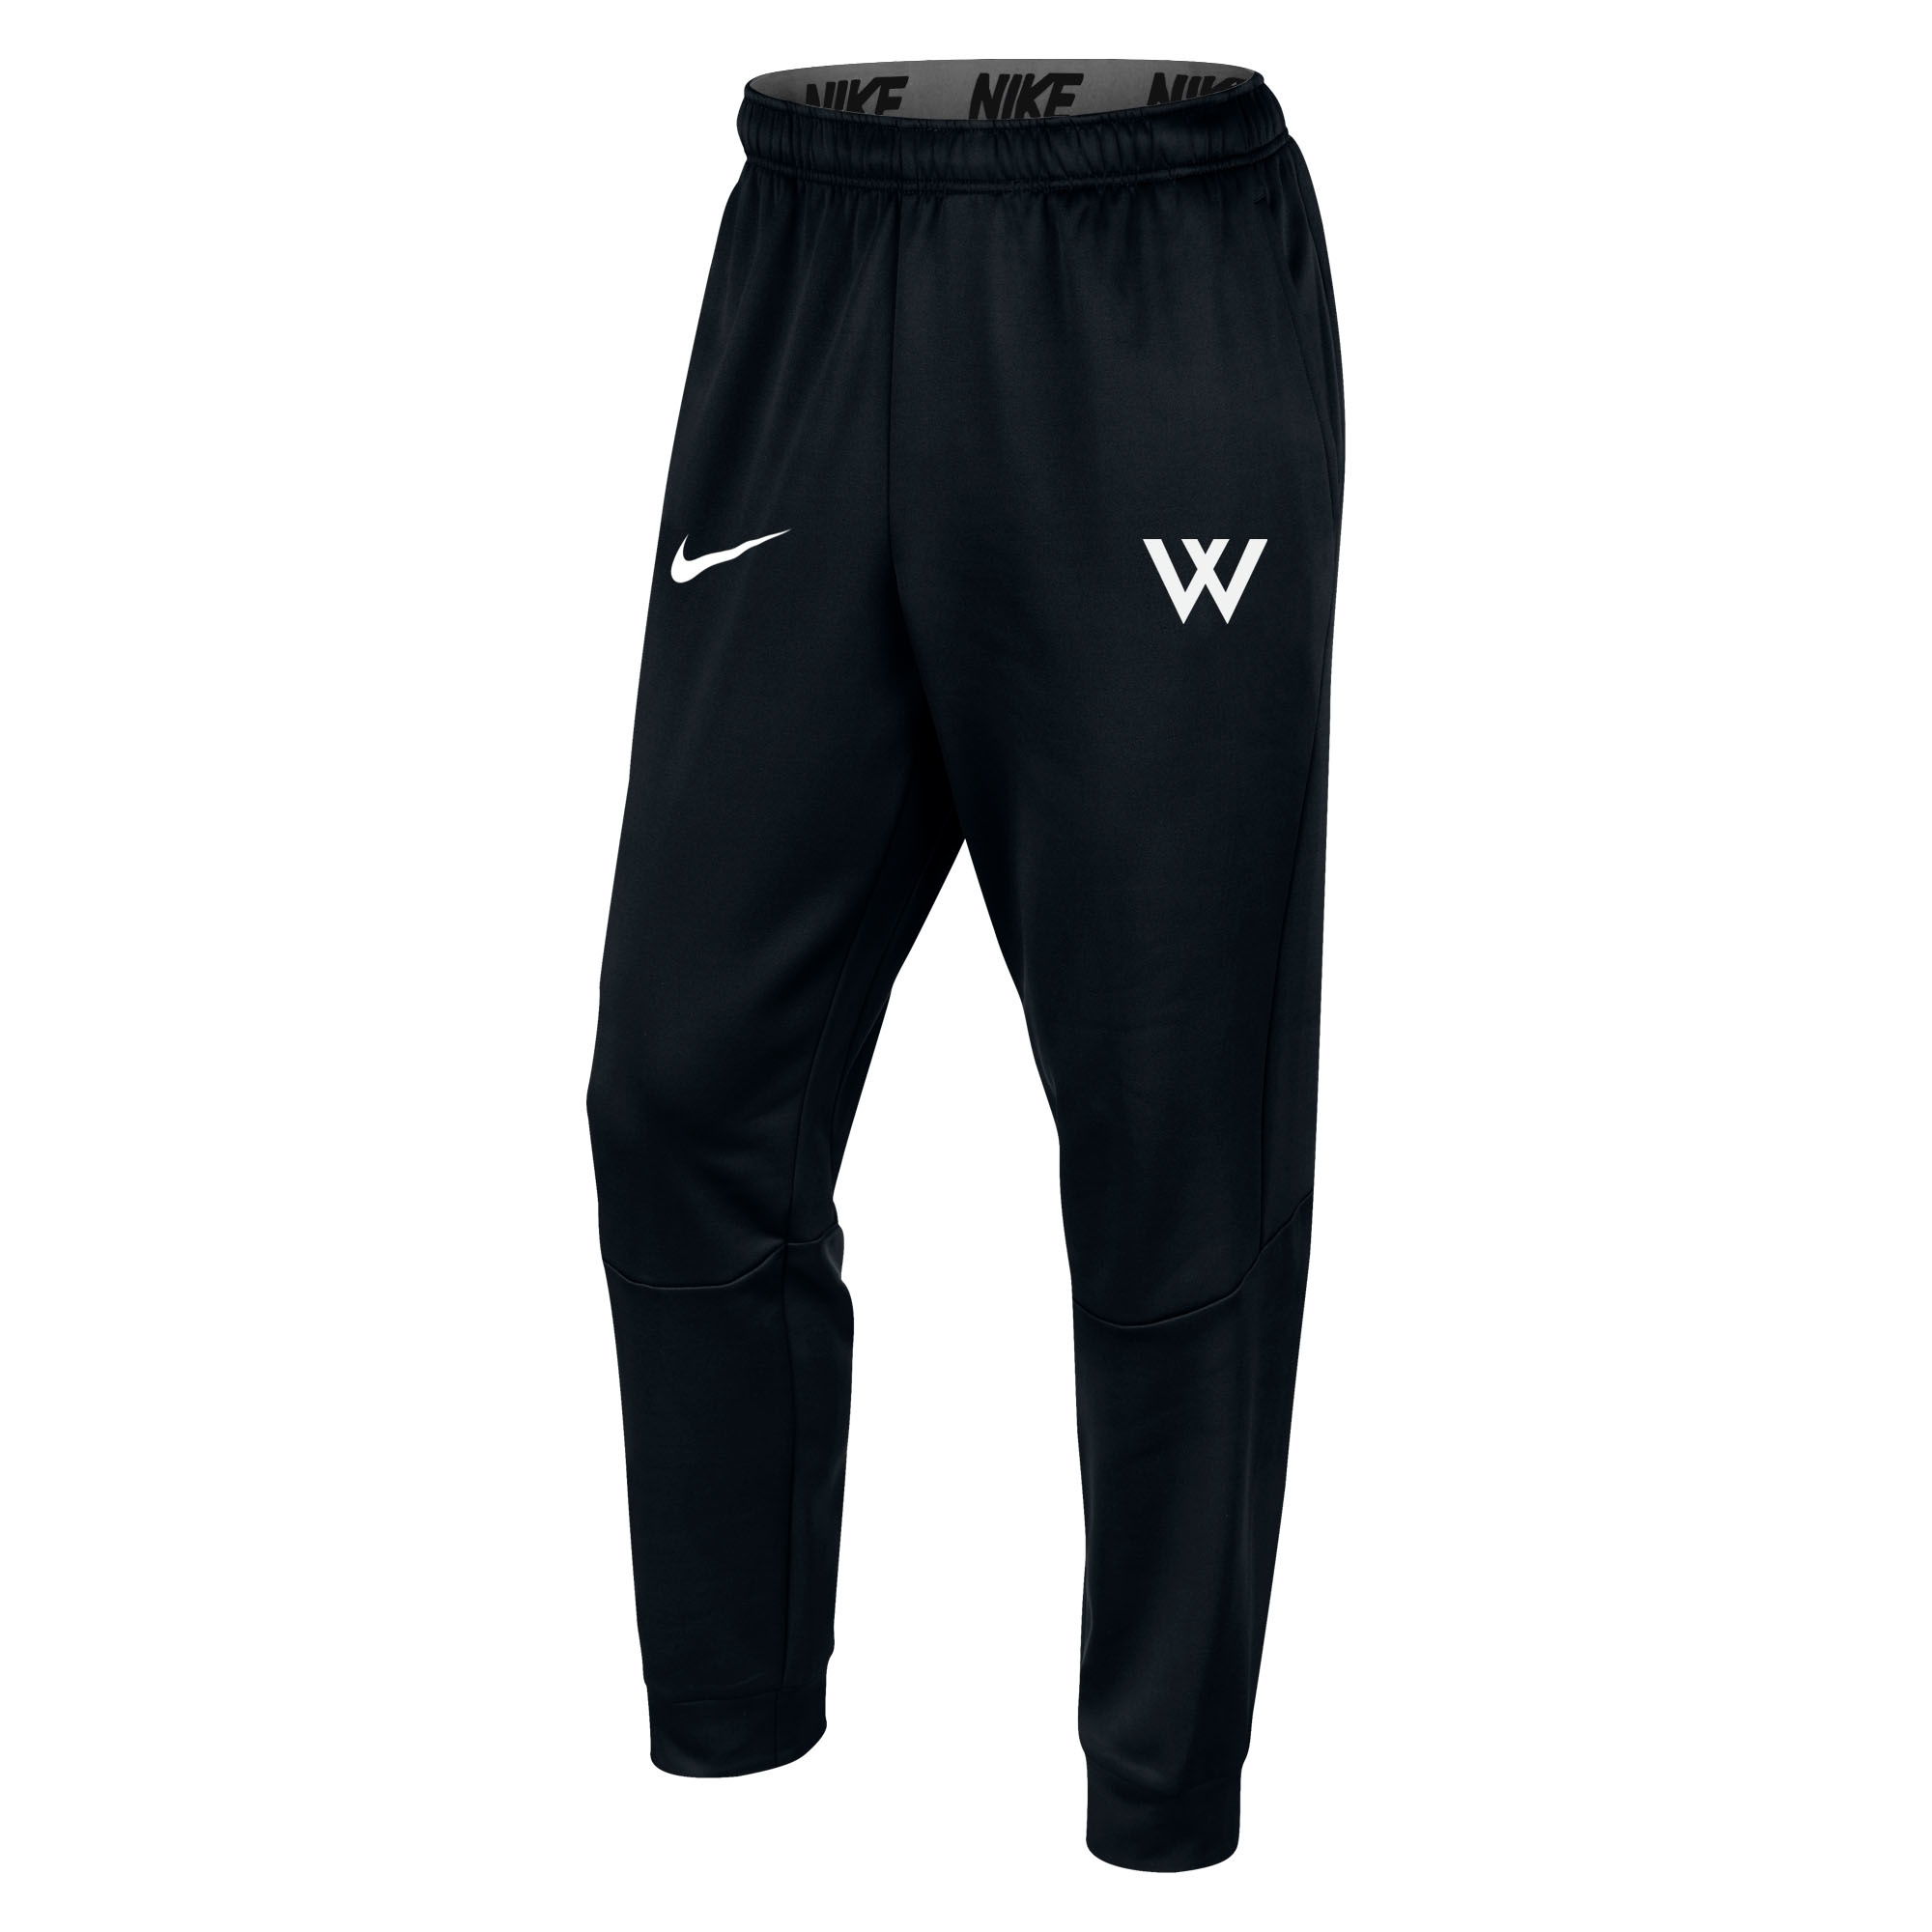 Nike Sweatpants: Nike Therma Tapered Pant